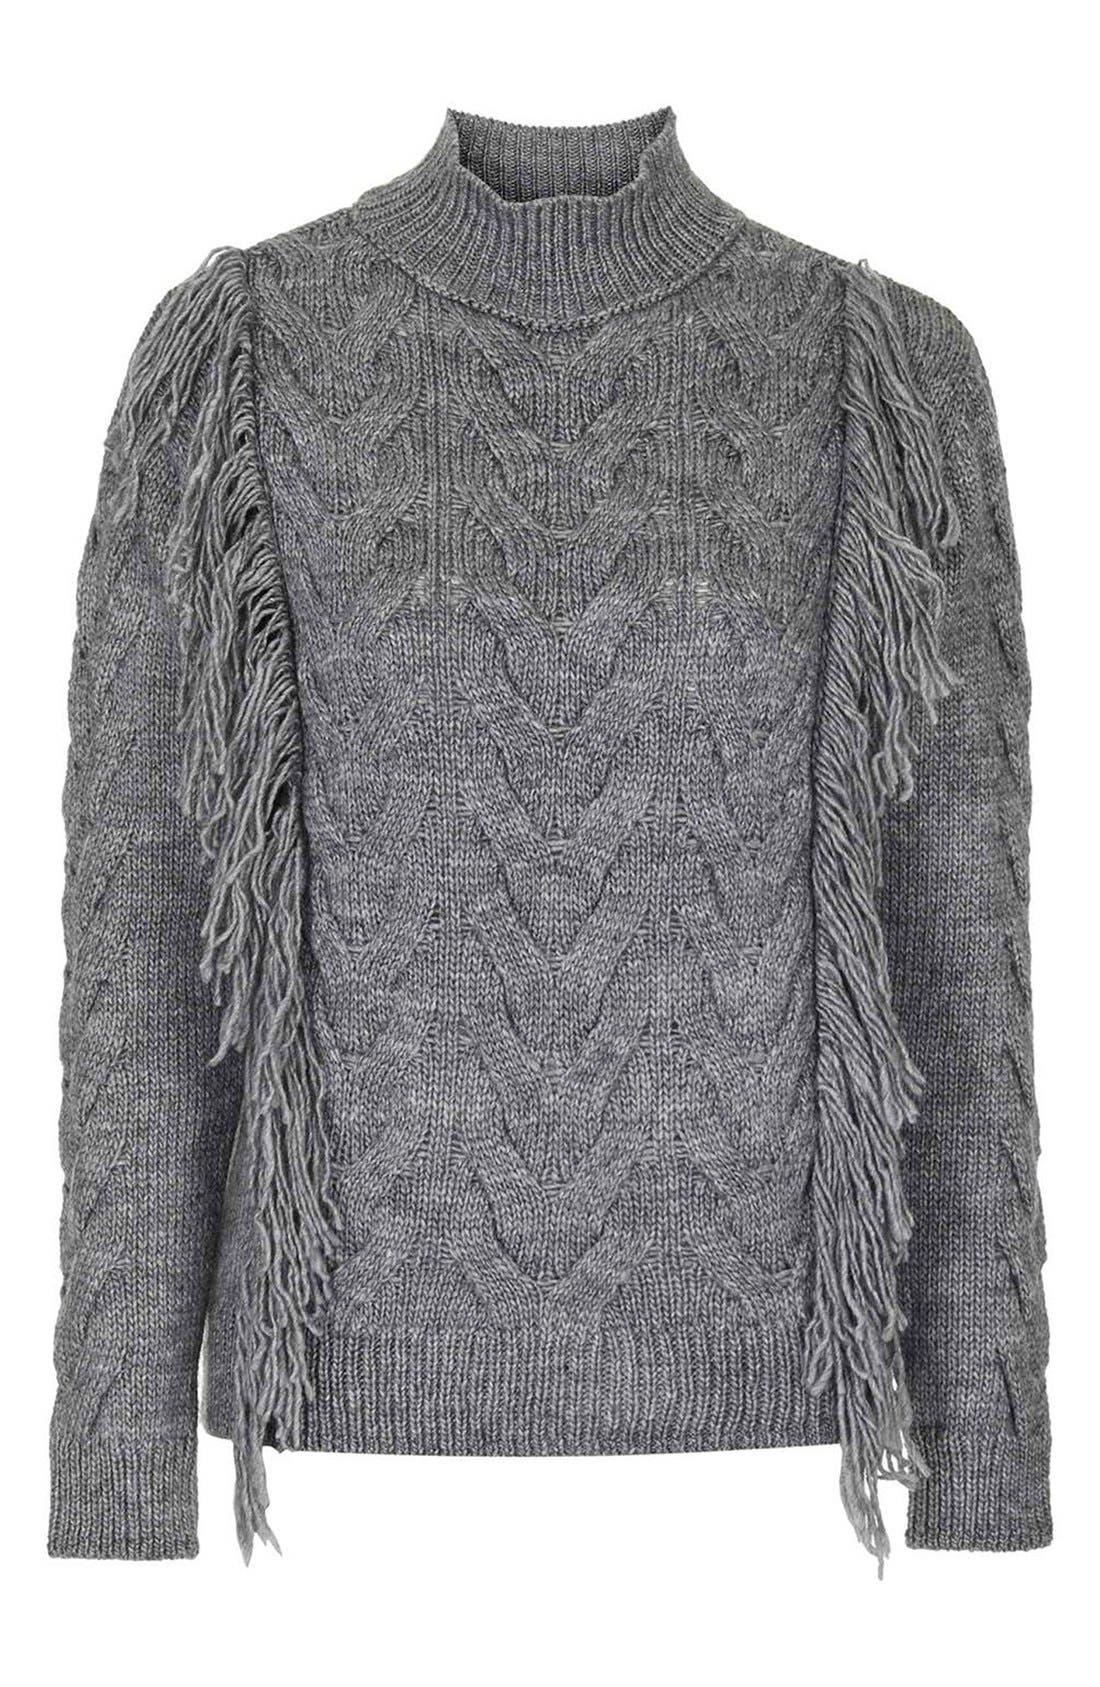 Alternate Image 4  - Topshop Fringe Cable Knit Sweater